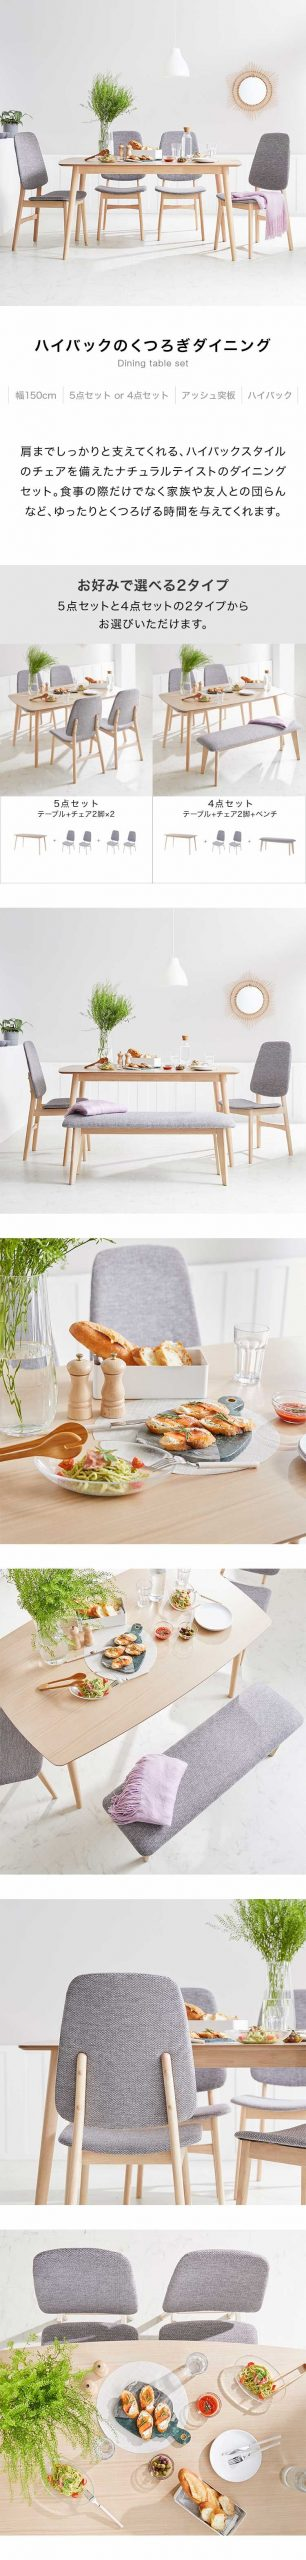 85 Awesome Salon De Jardin Villaverde – Chair Ideas pour Salon De Jardin Villaverde